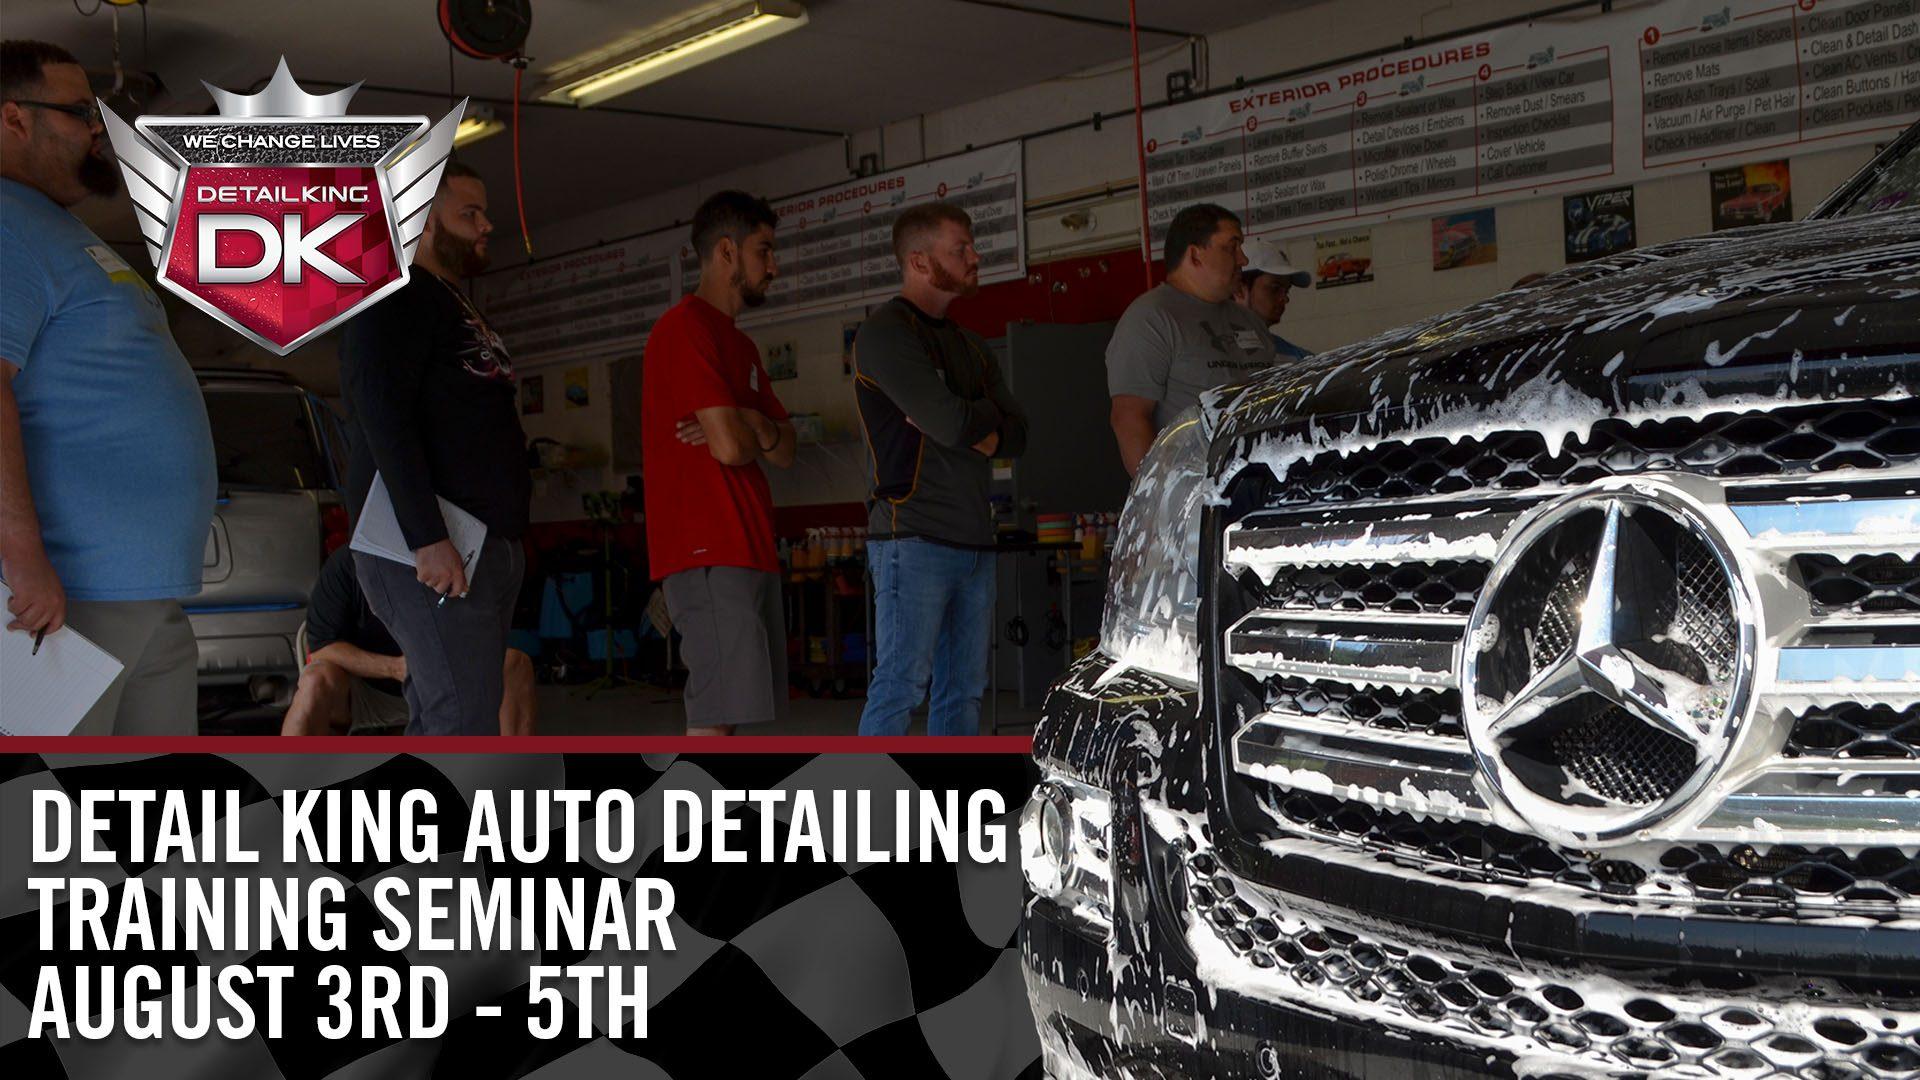 August 3rd – 5th 2018 Craftsman Auto Detailing Training Seminar